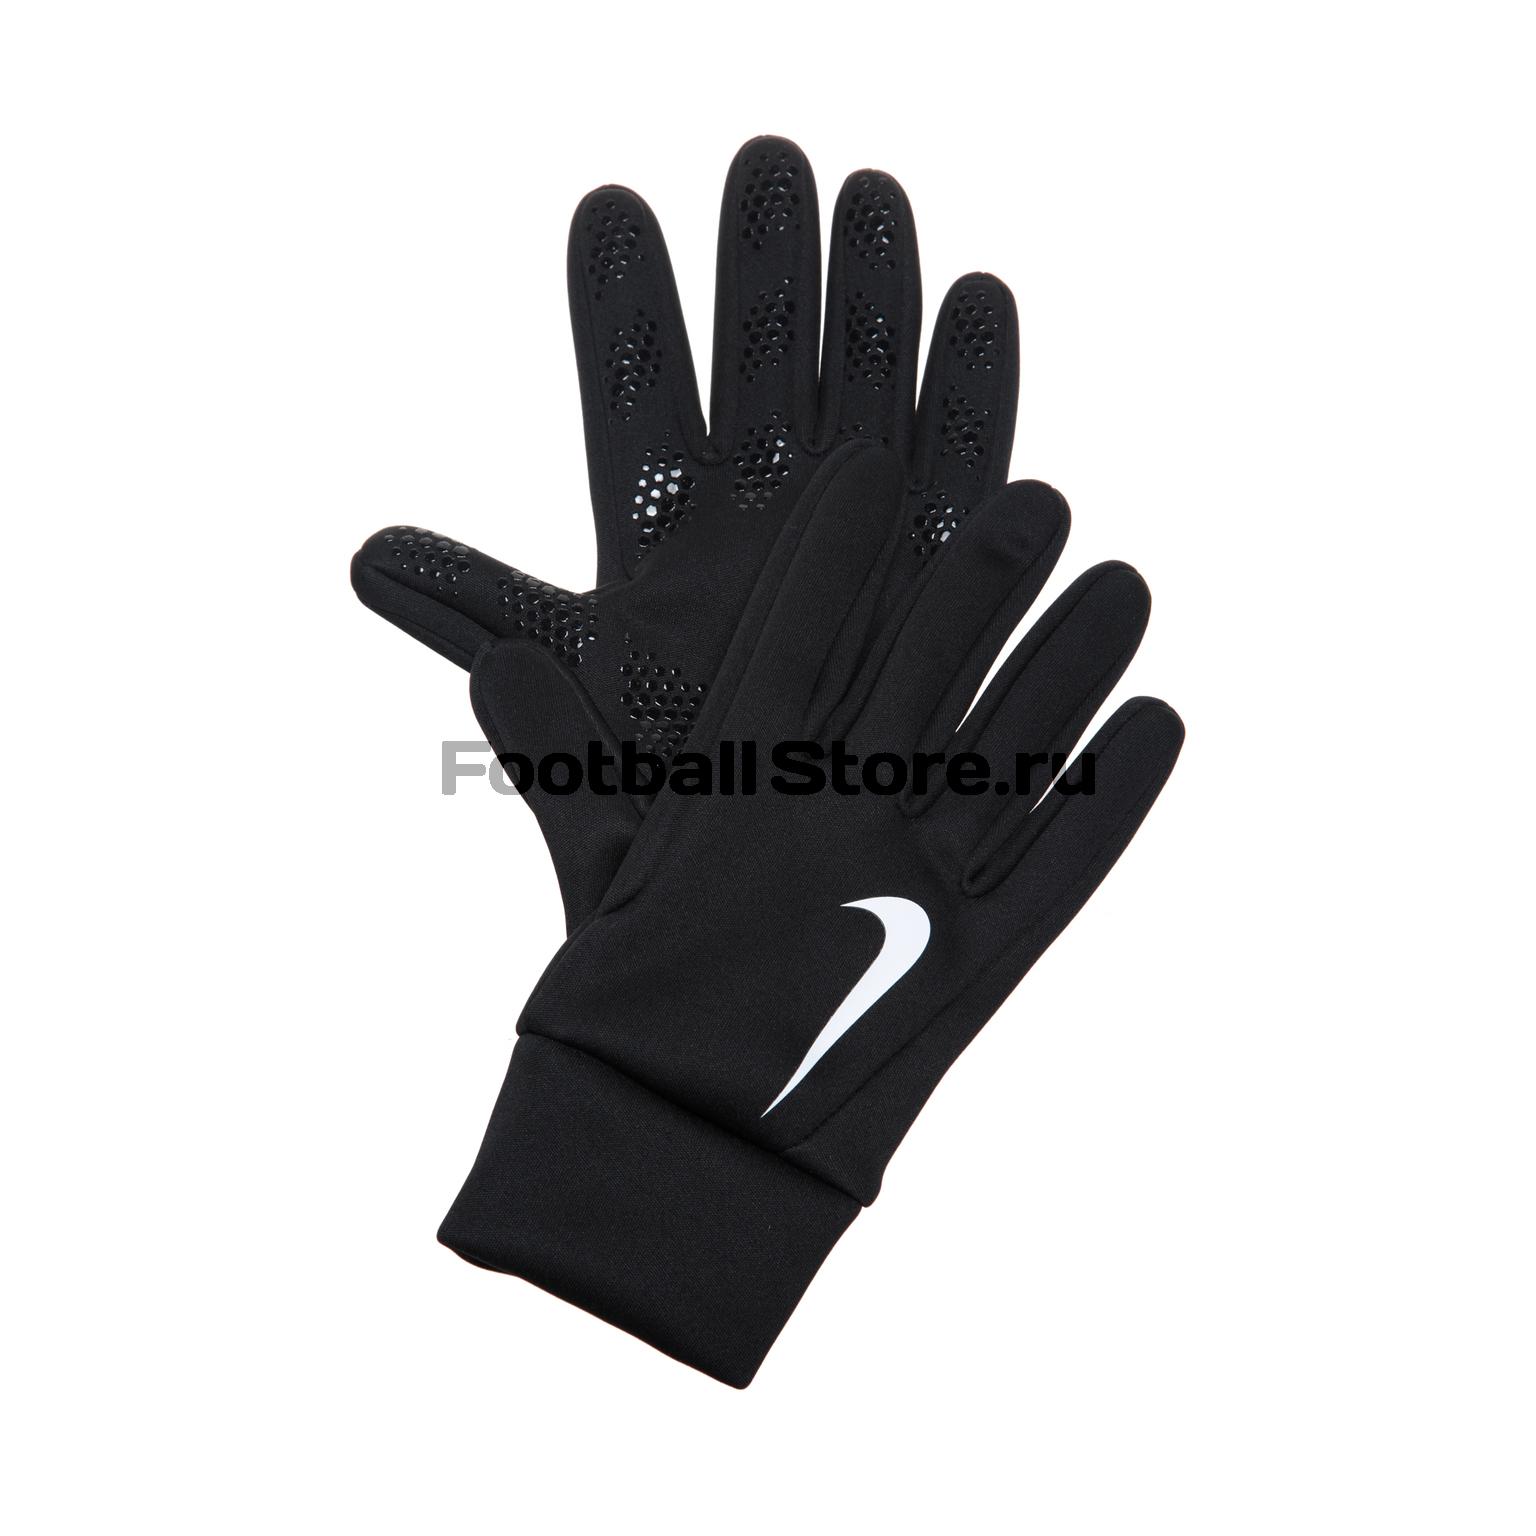 Перчатки тренировочные Nike HyperWarm GS0321-013 перчатки мма everlast перчатки тренировочные prime mma l xl